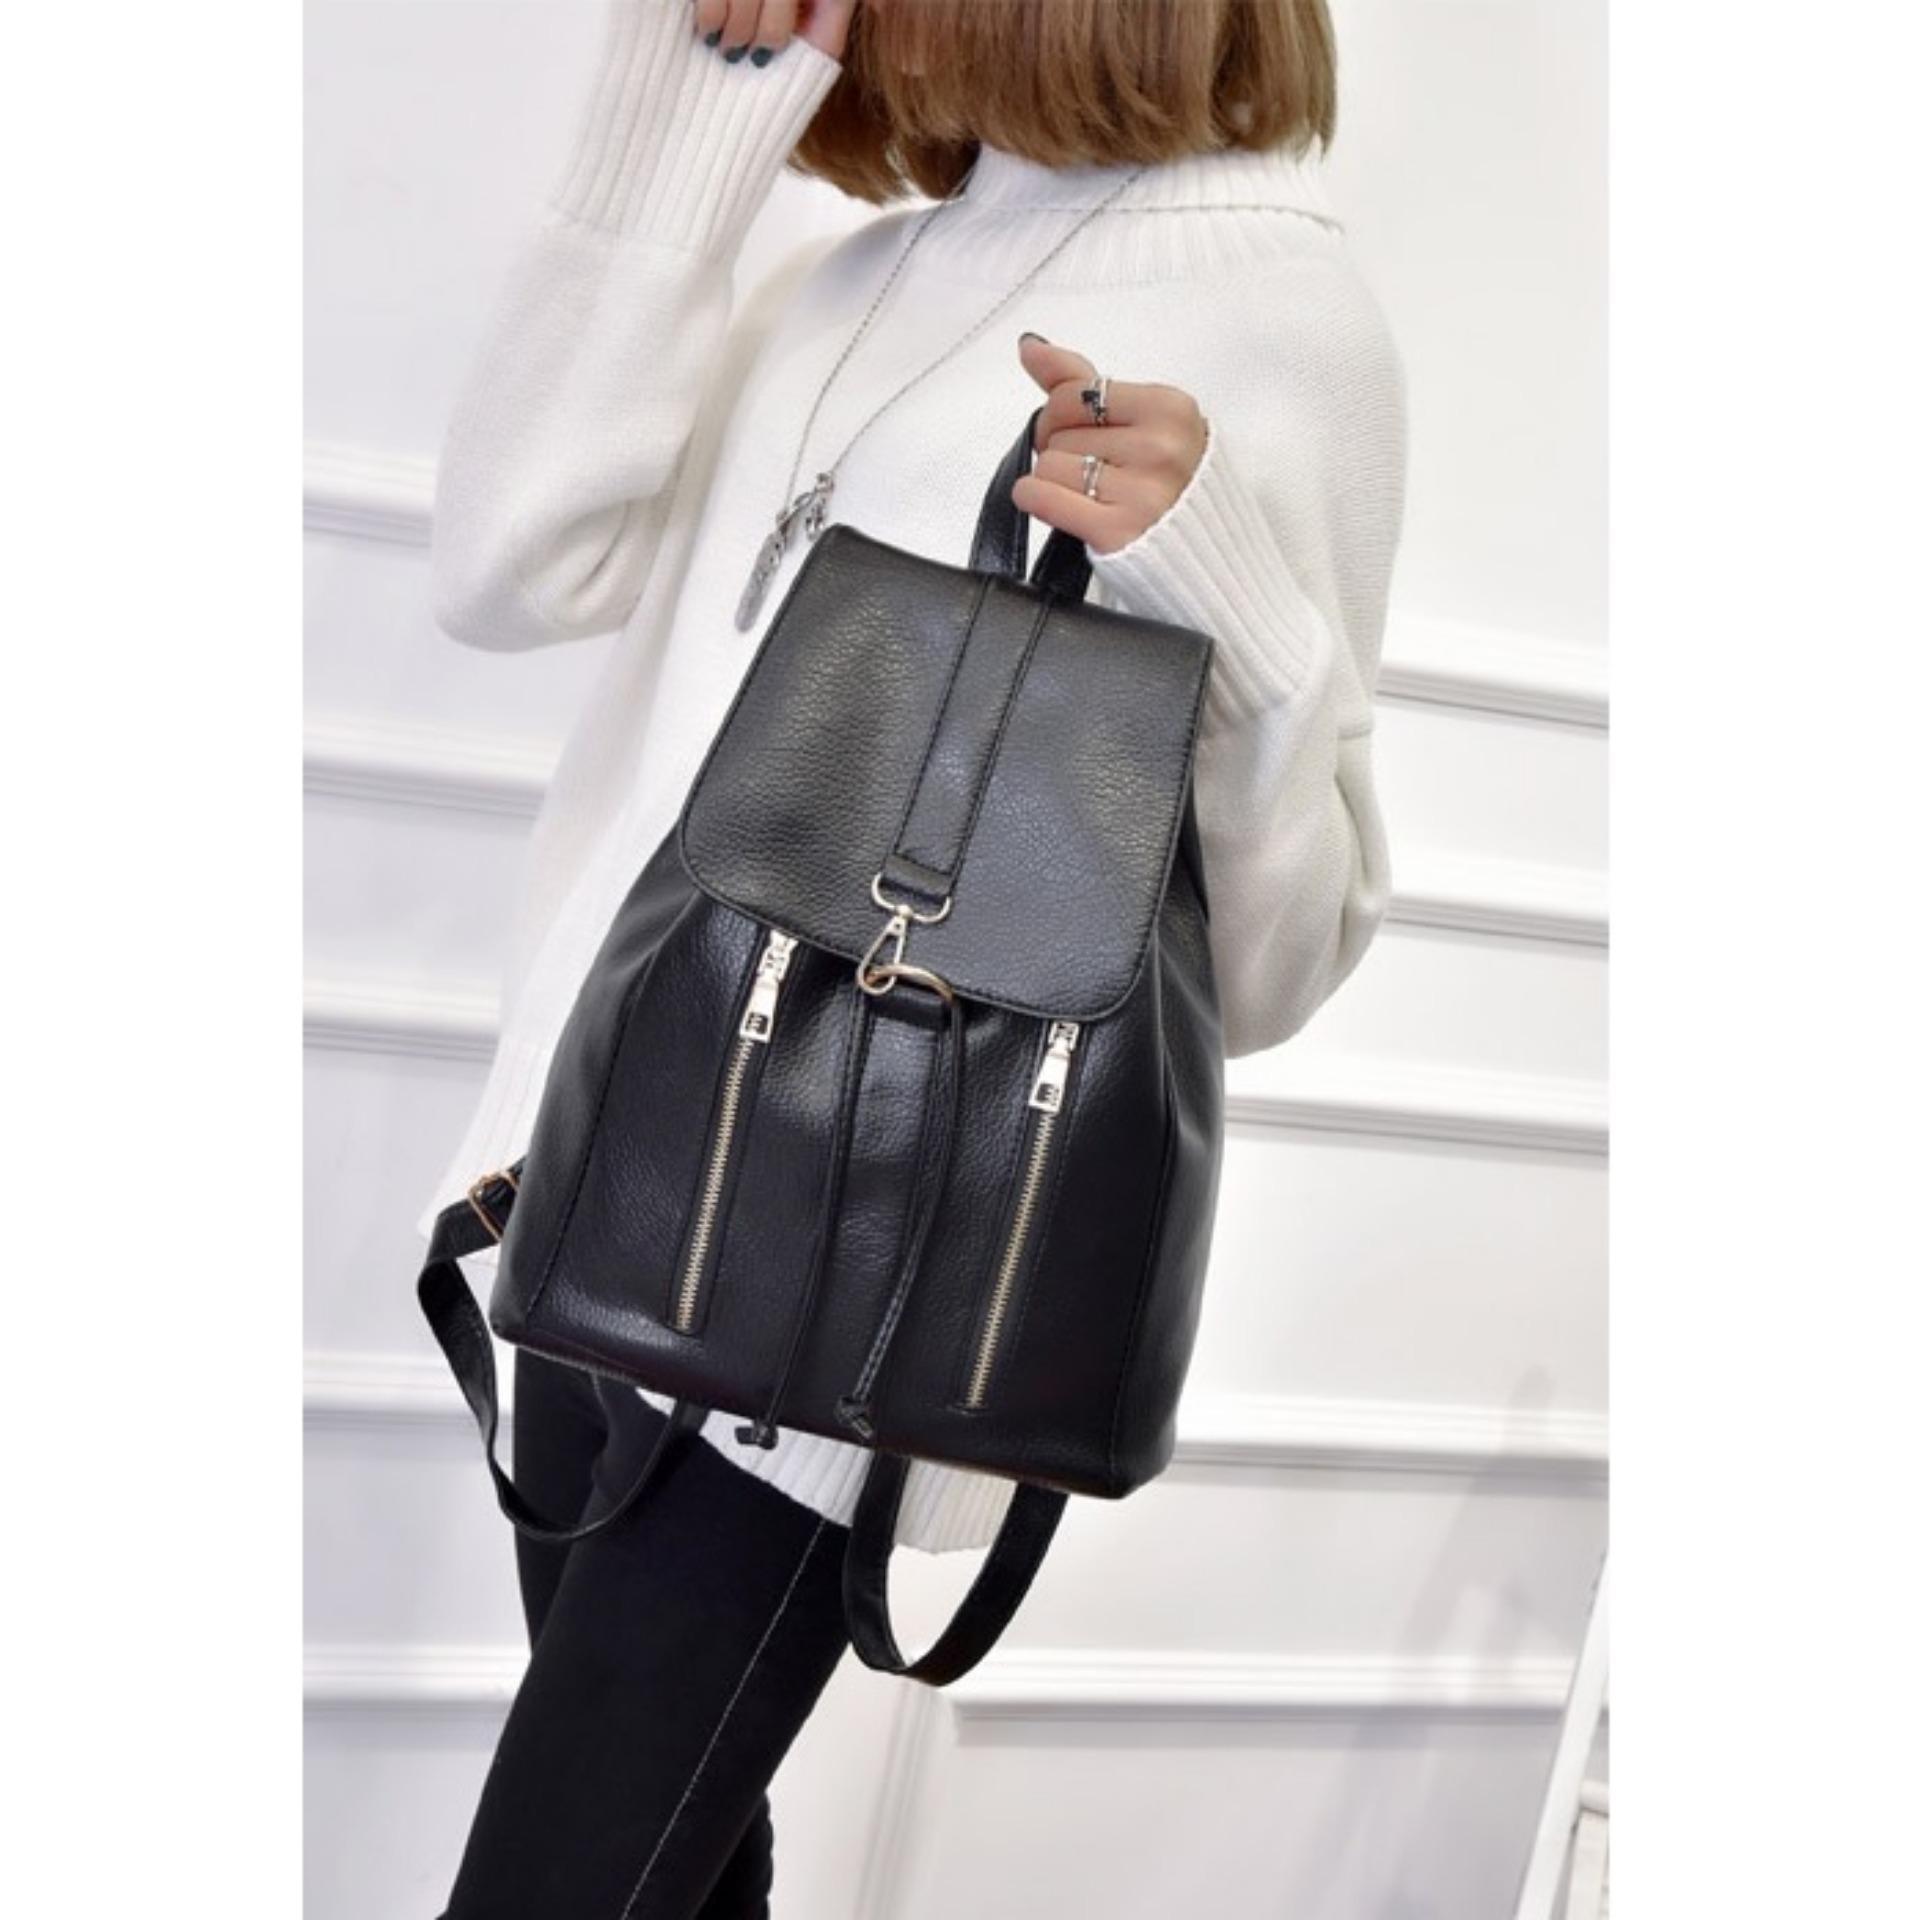 JCF Tas Ransel Kulit PU Import Korean Style Fashion Branded Wanita Remaja  Dan . d3921f8281